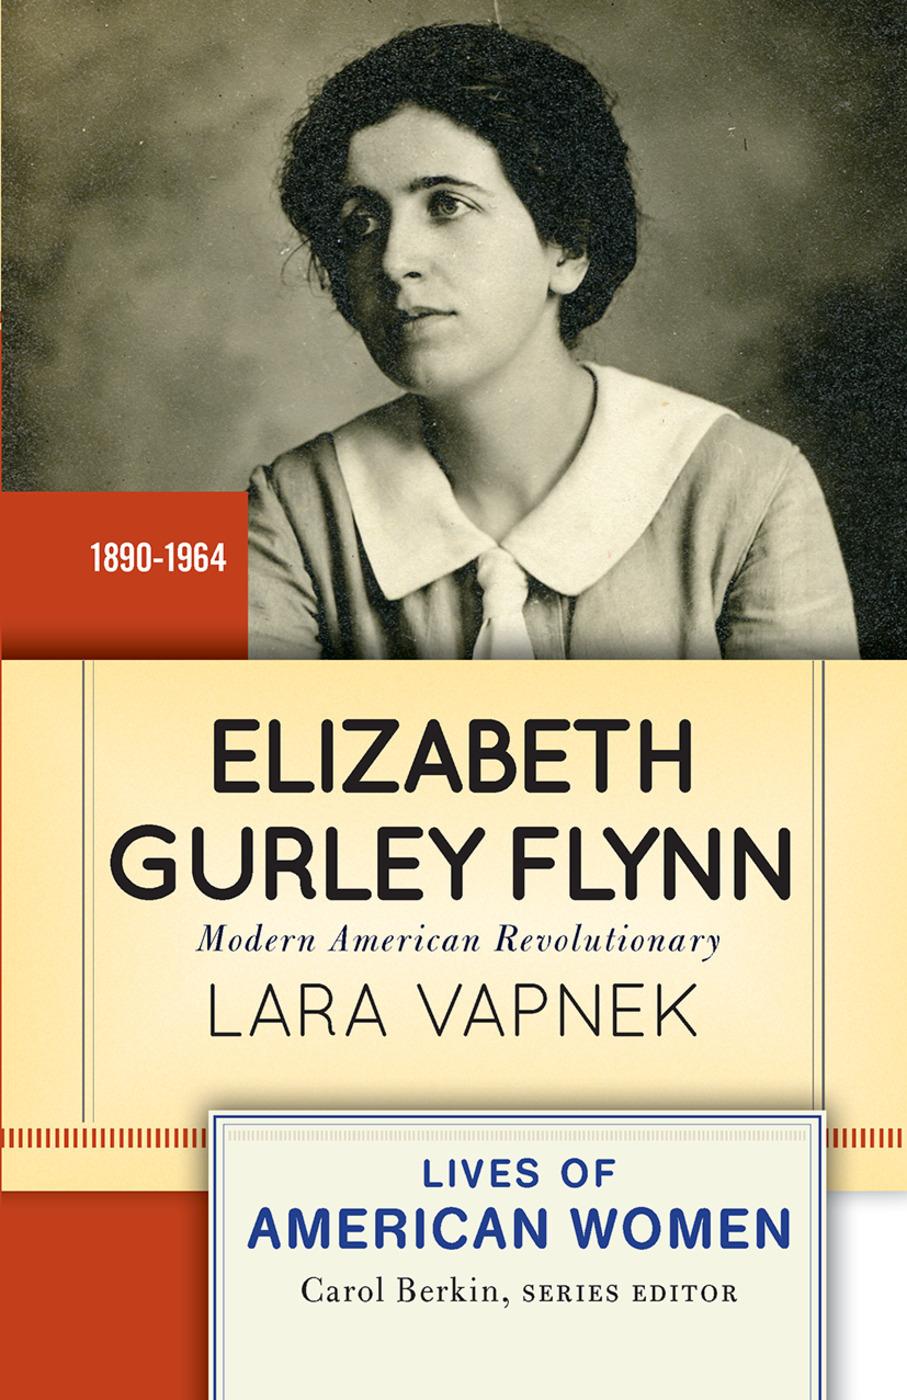 Cover of the book: Elizabeth Gurley Flynn: Modern American Revolutionary - with Elizabeth Gurly's Flynn's portrait on it.